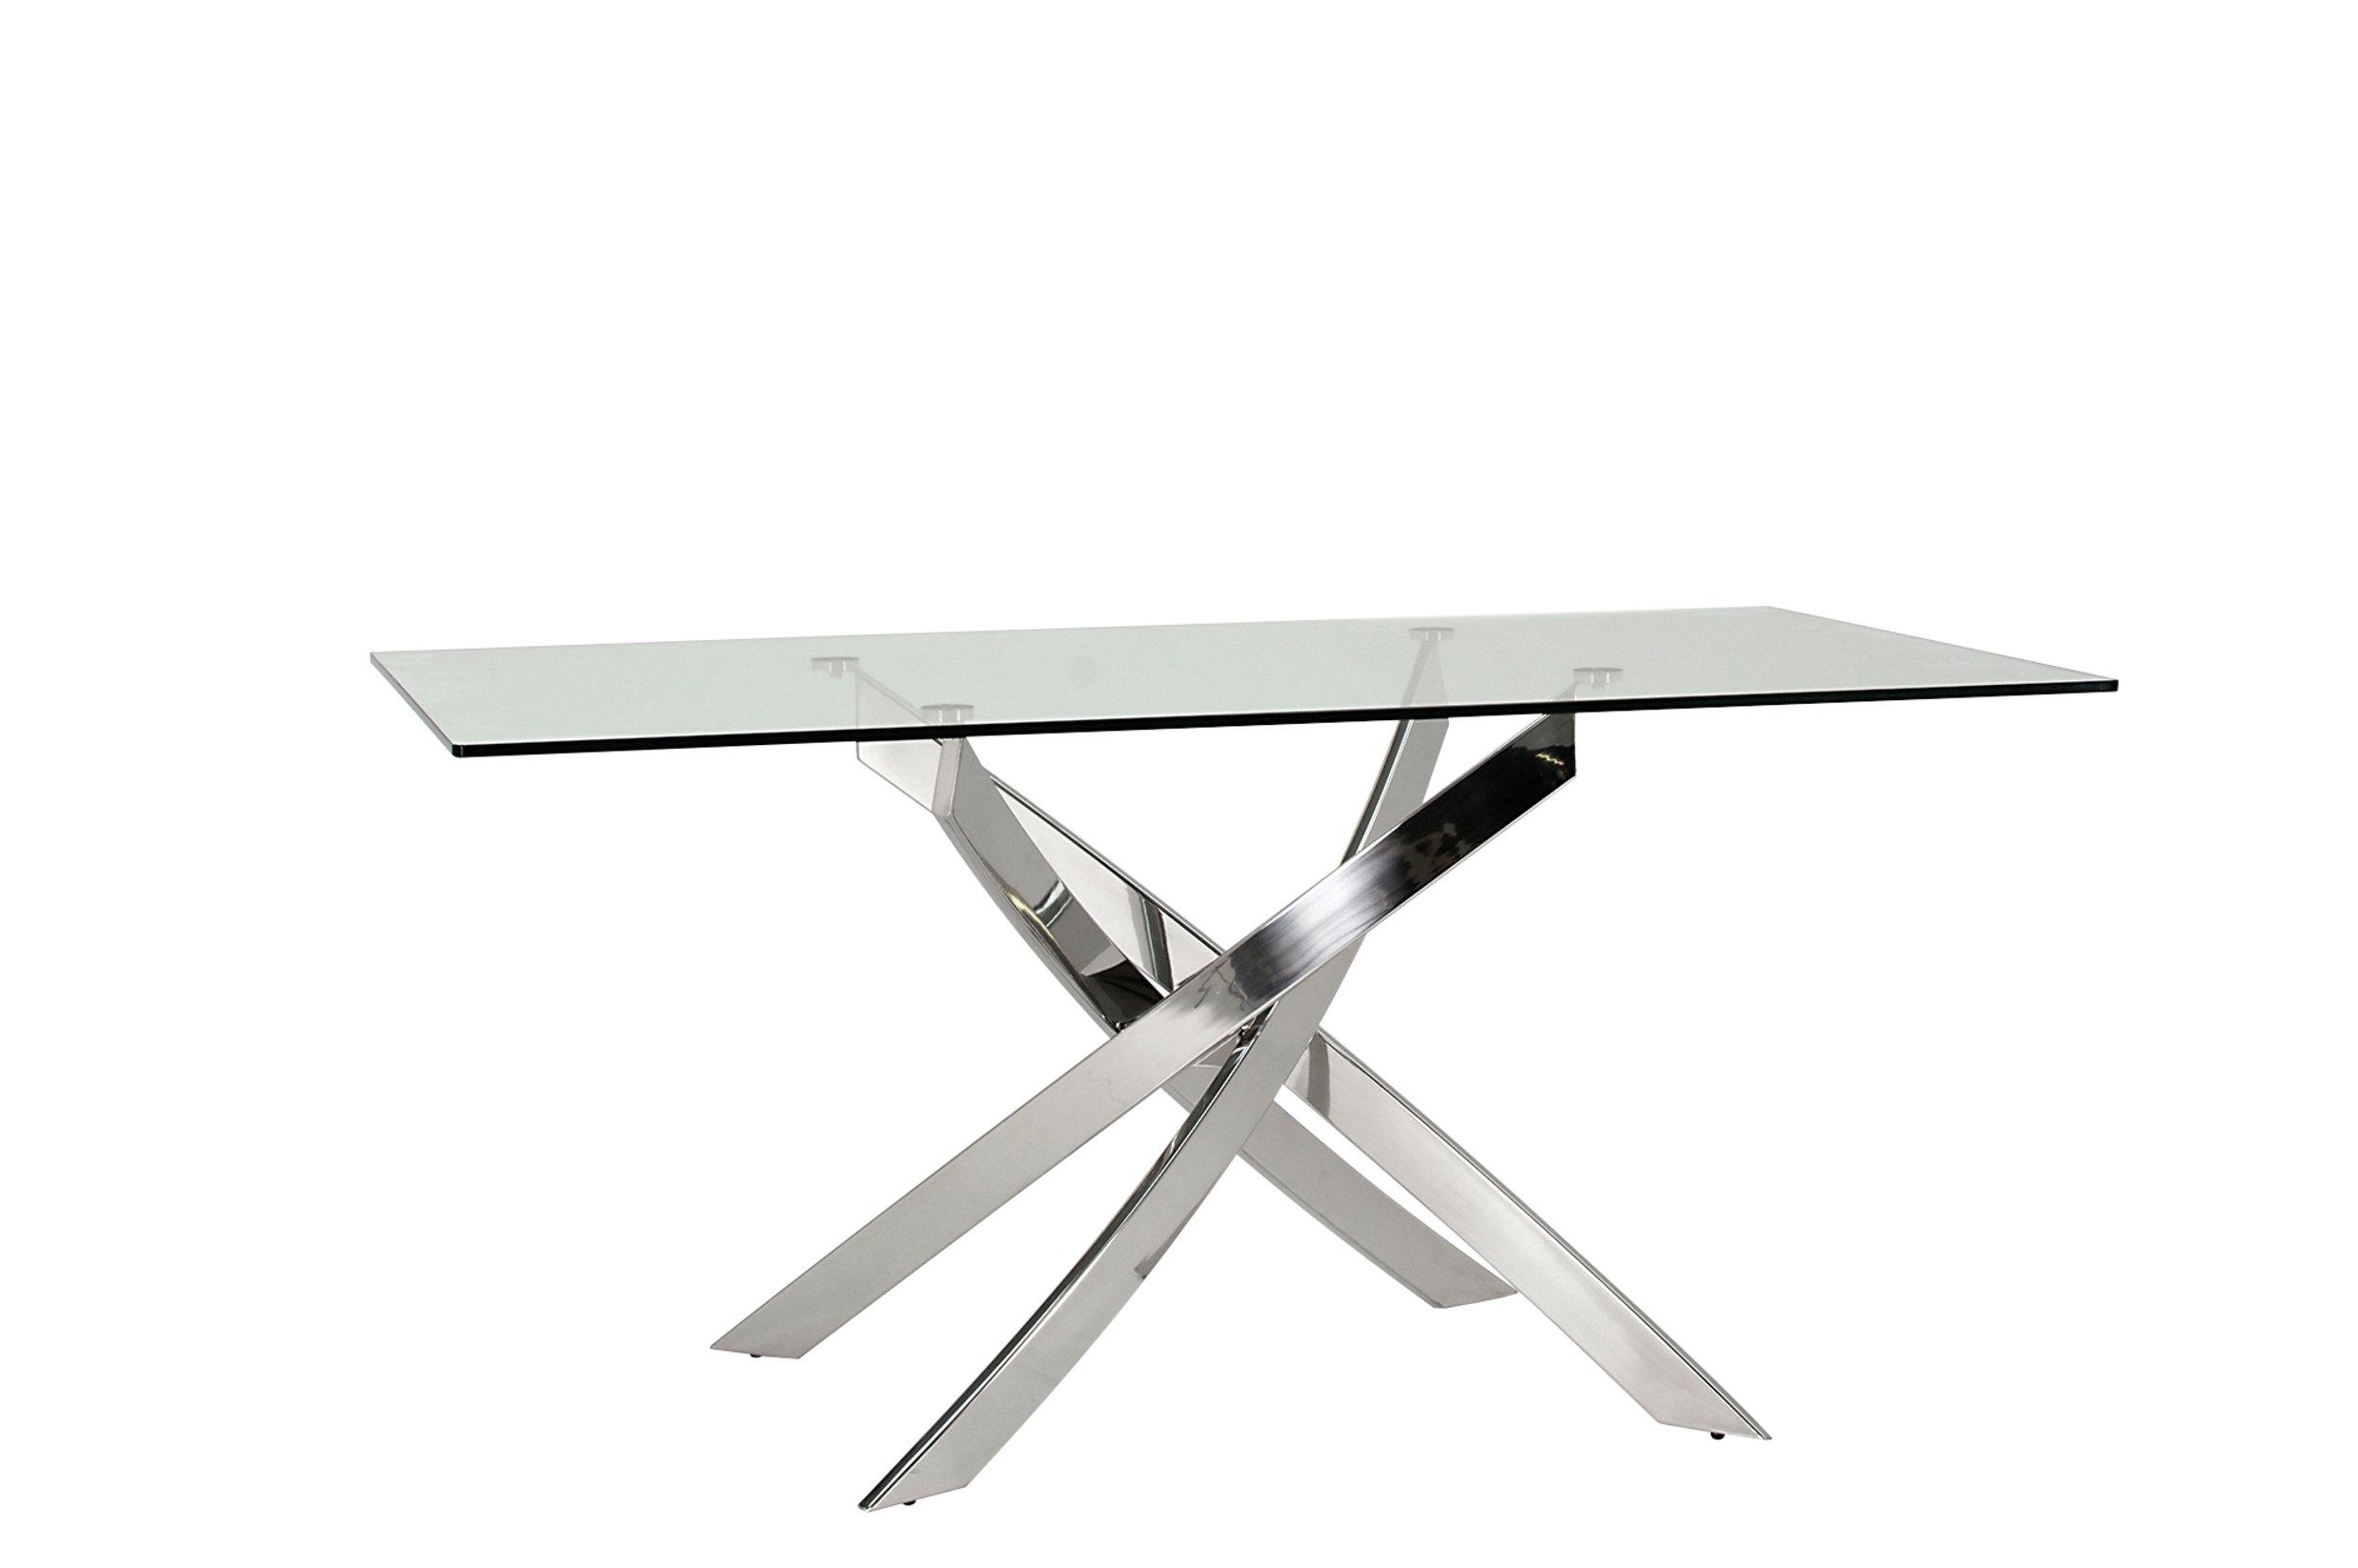 Furnoko Kalmar Glass 4 Seater Table - Clear